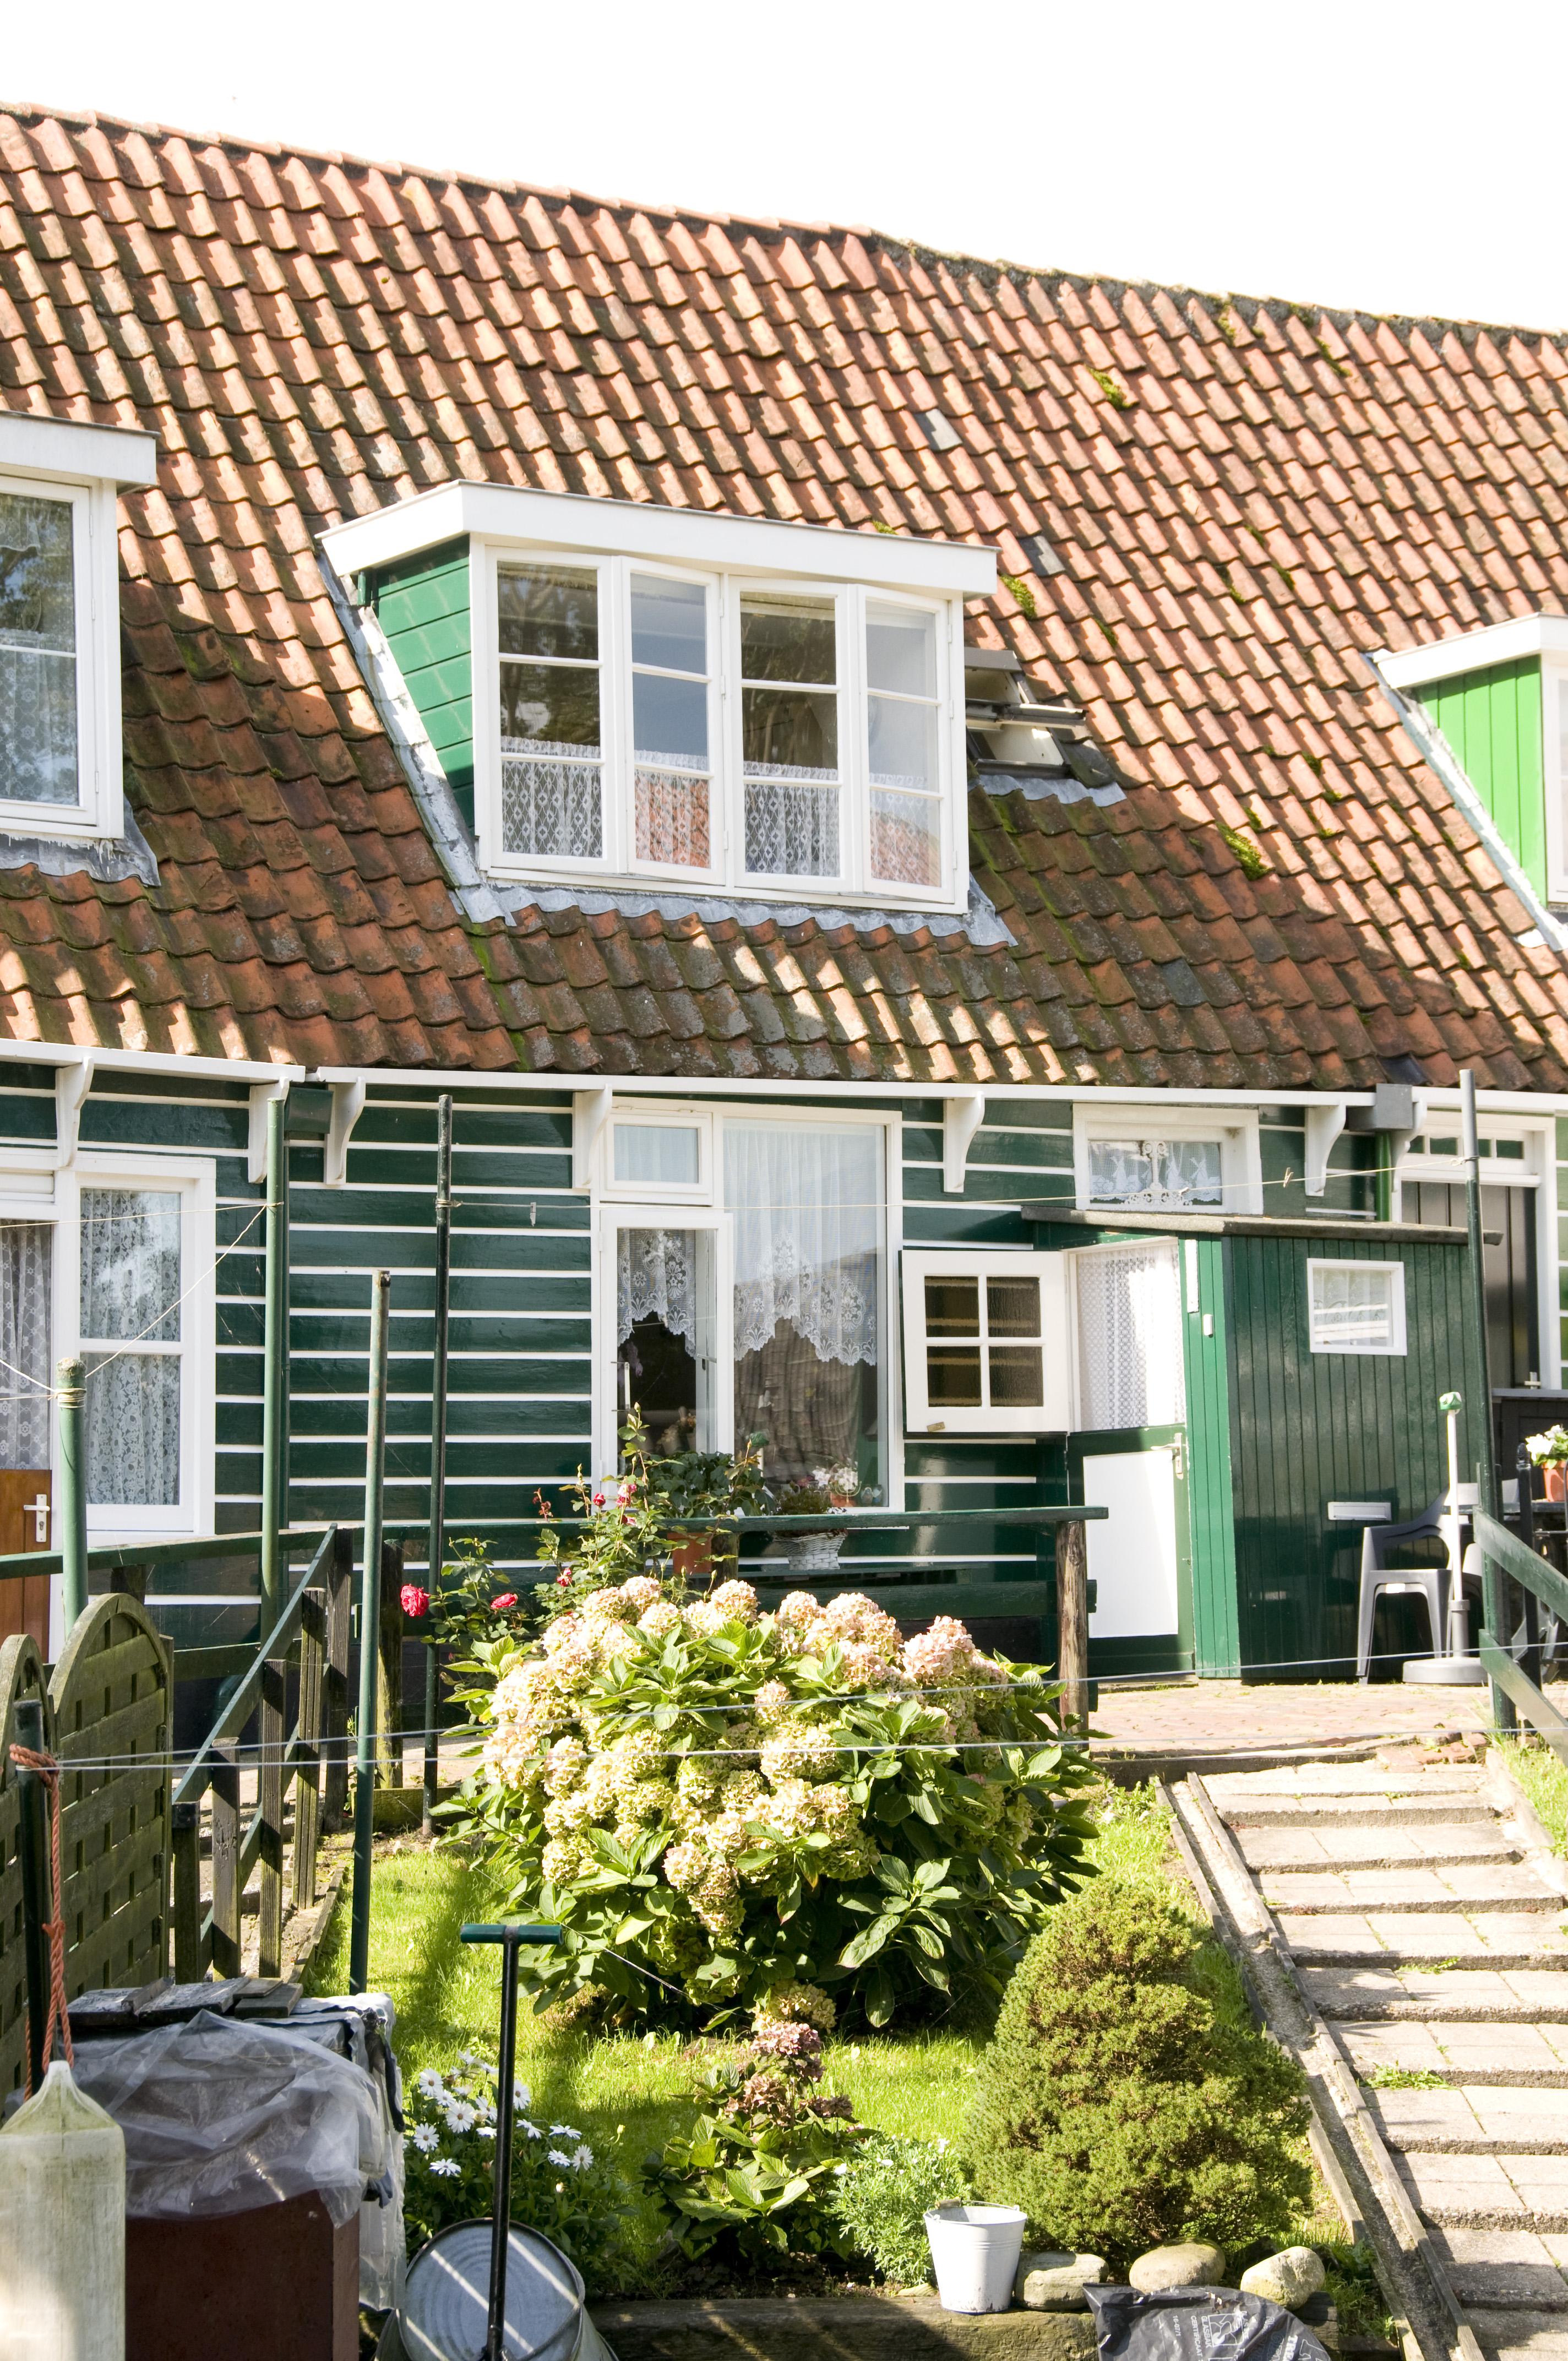 Houten huis in marken monument for Hout huis